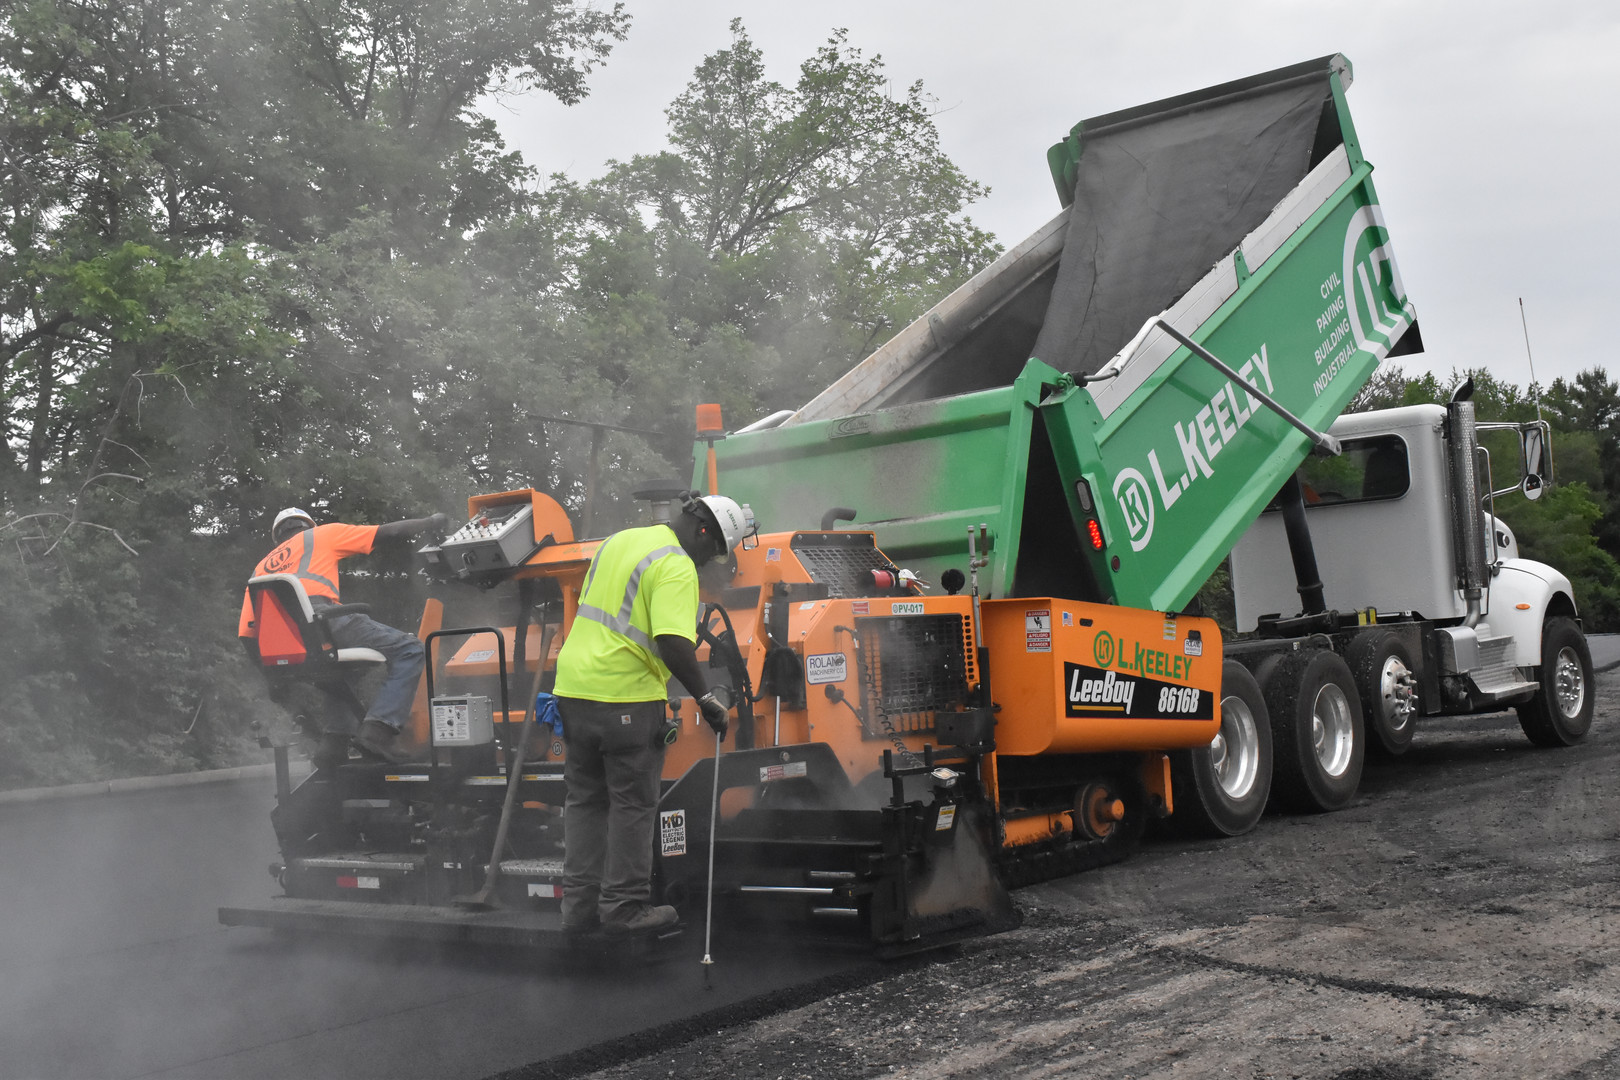 L Keeley Construction Paving Kohls